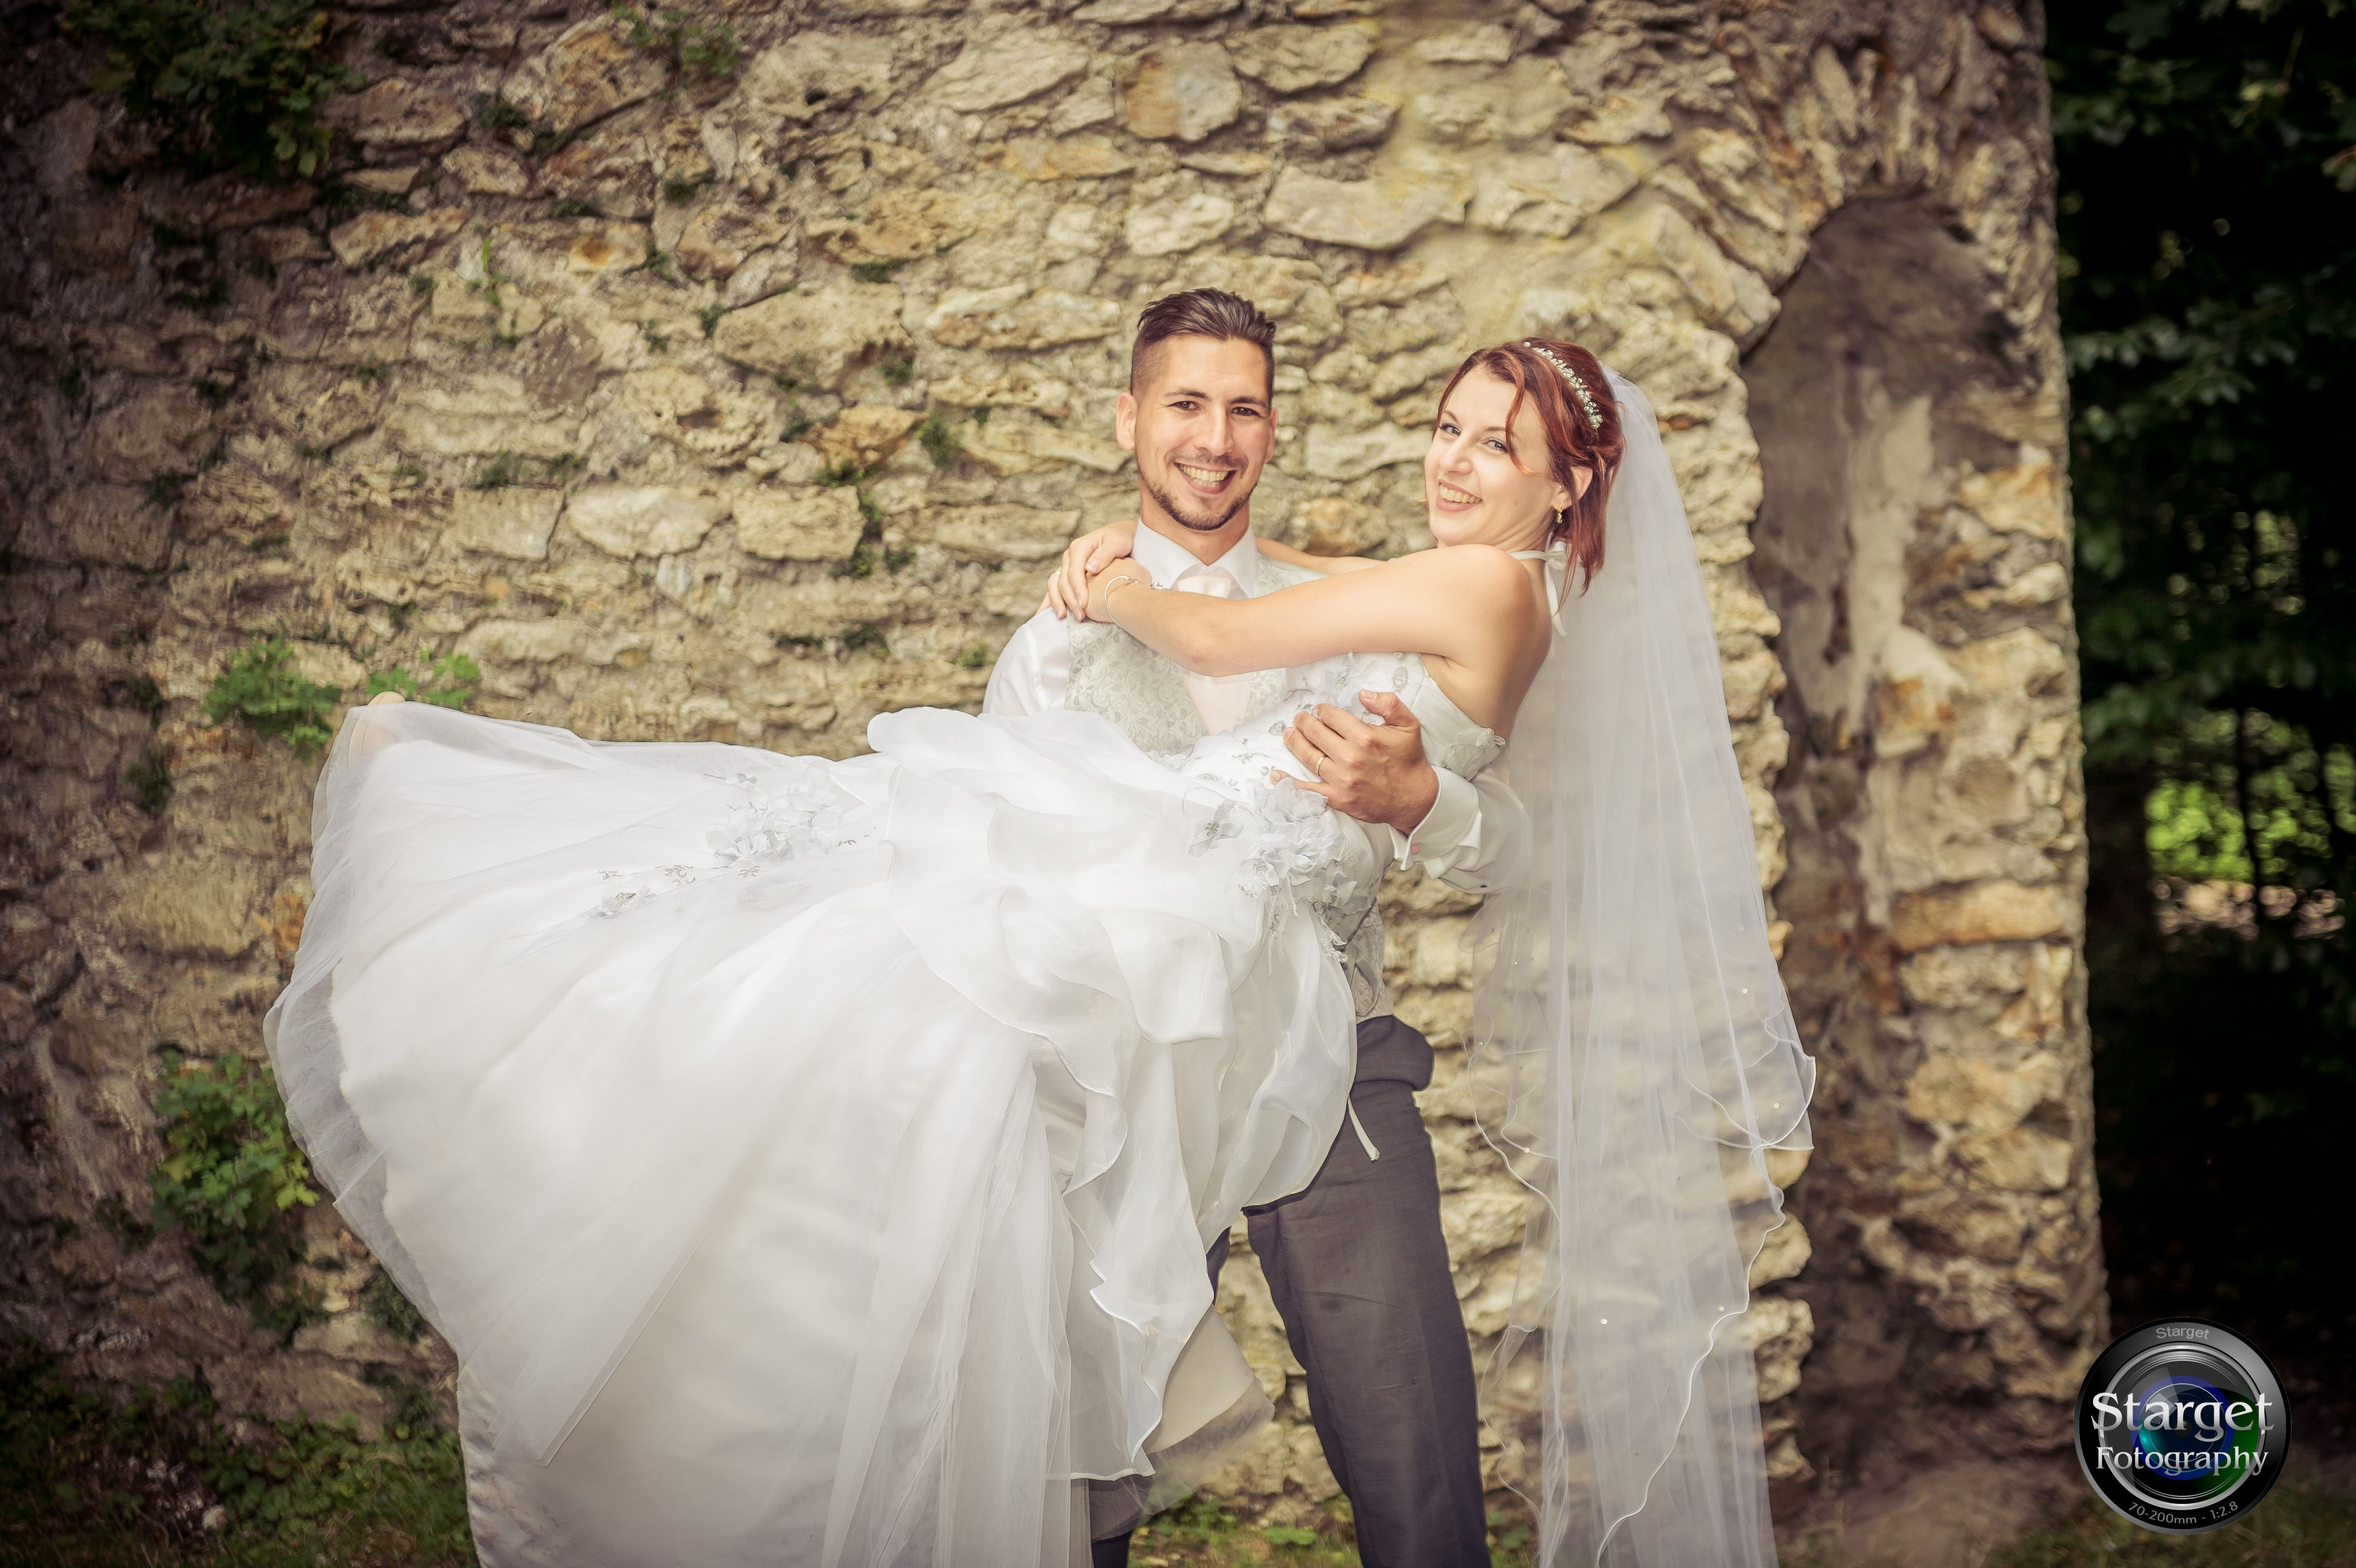 robe mariée mariage cérémonie Eglise robe de mariée union